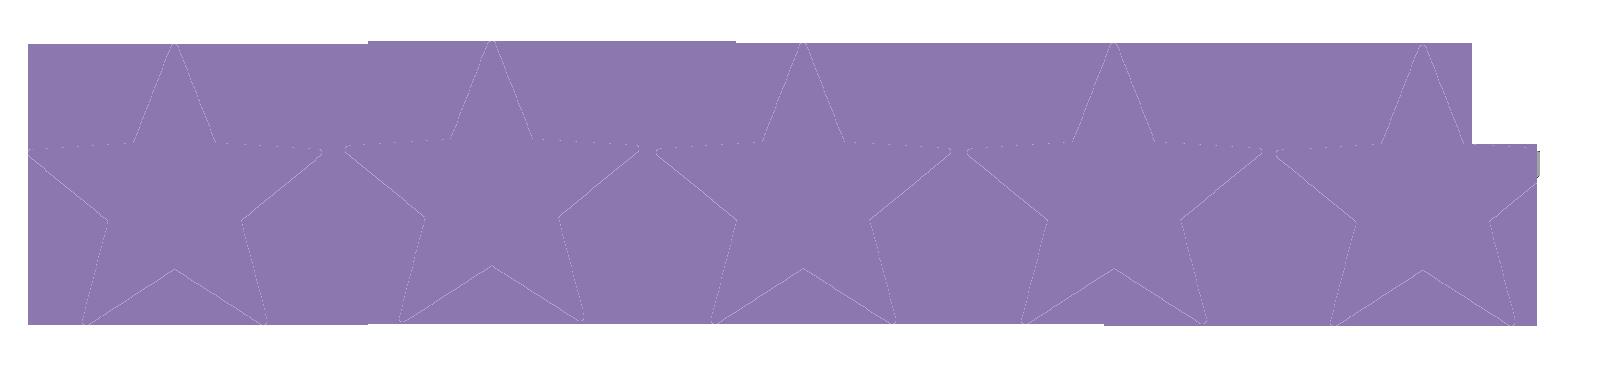 4_9Stars